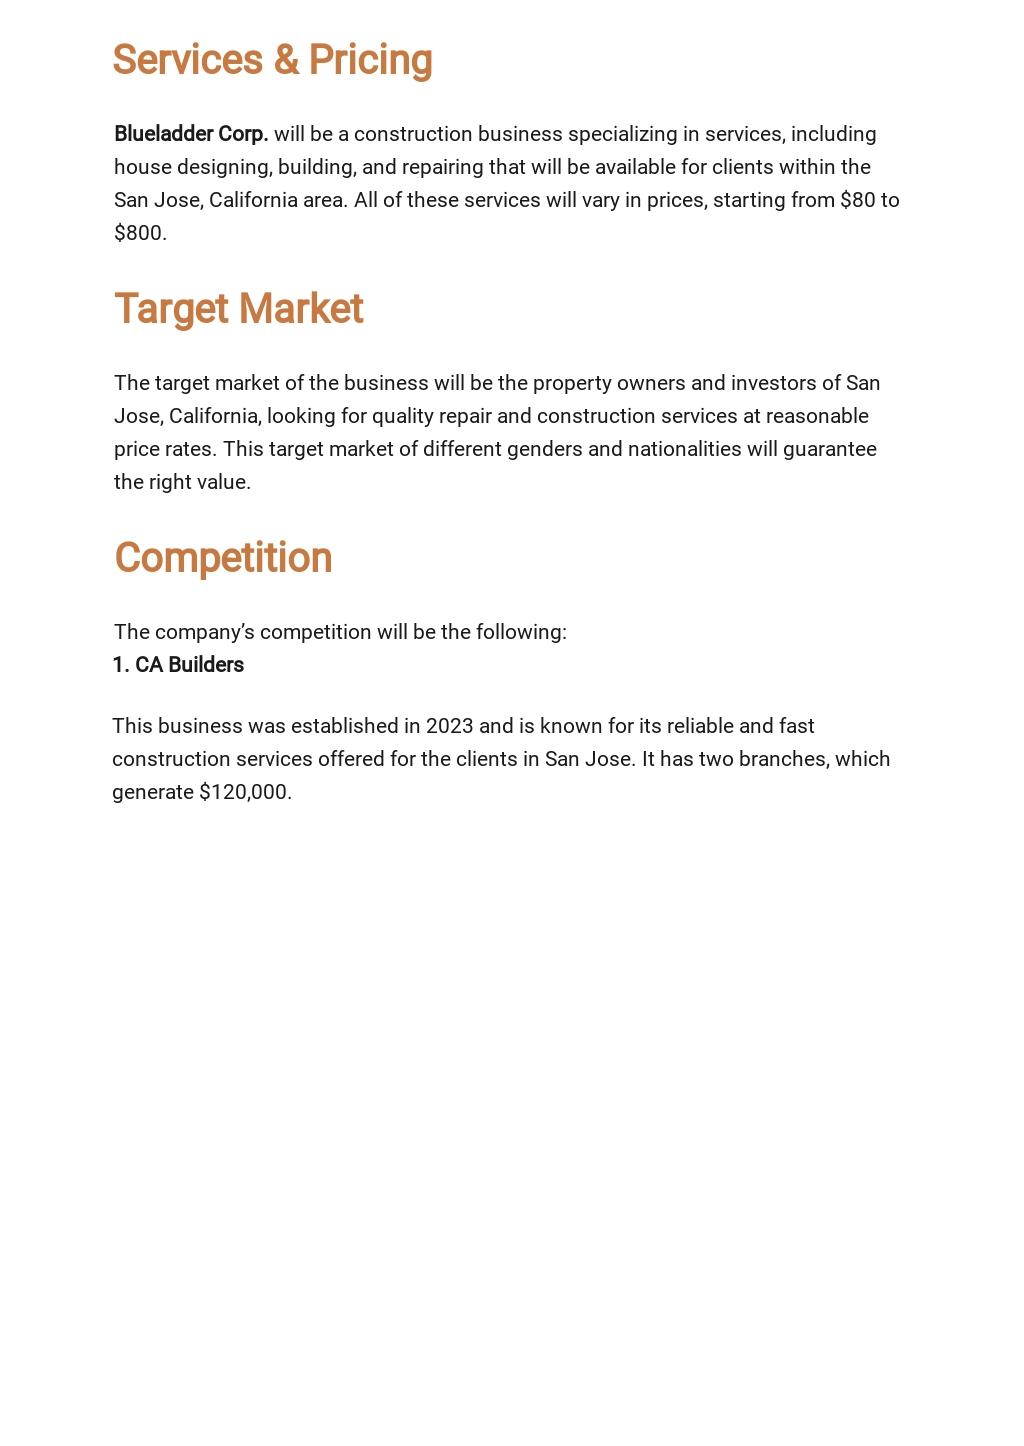 Construction Company Business Plan Template 2.jpe